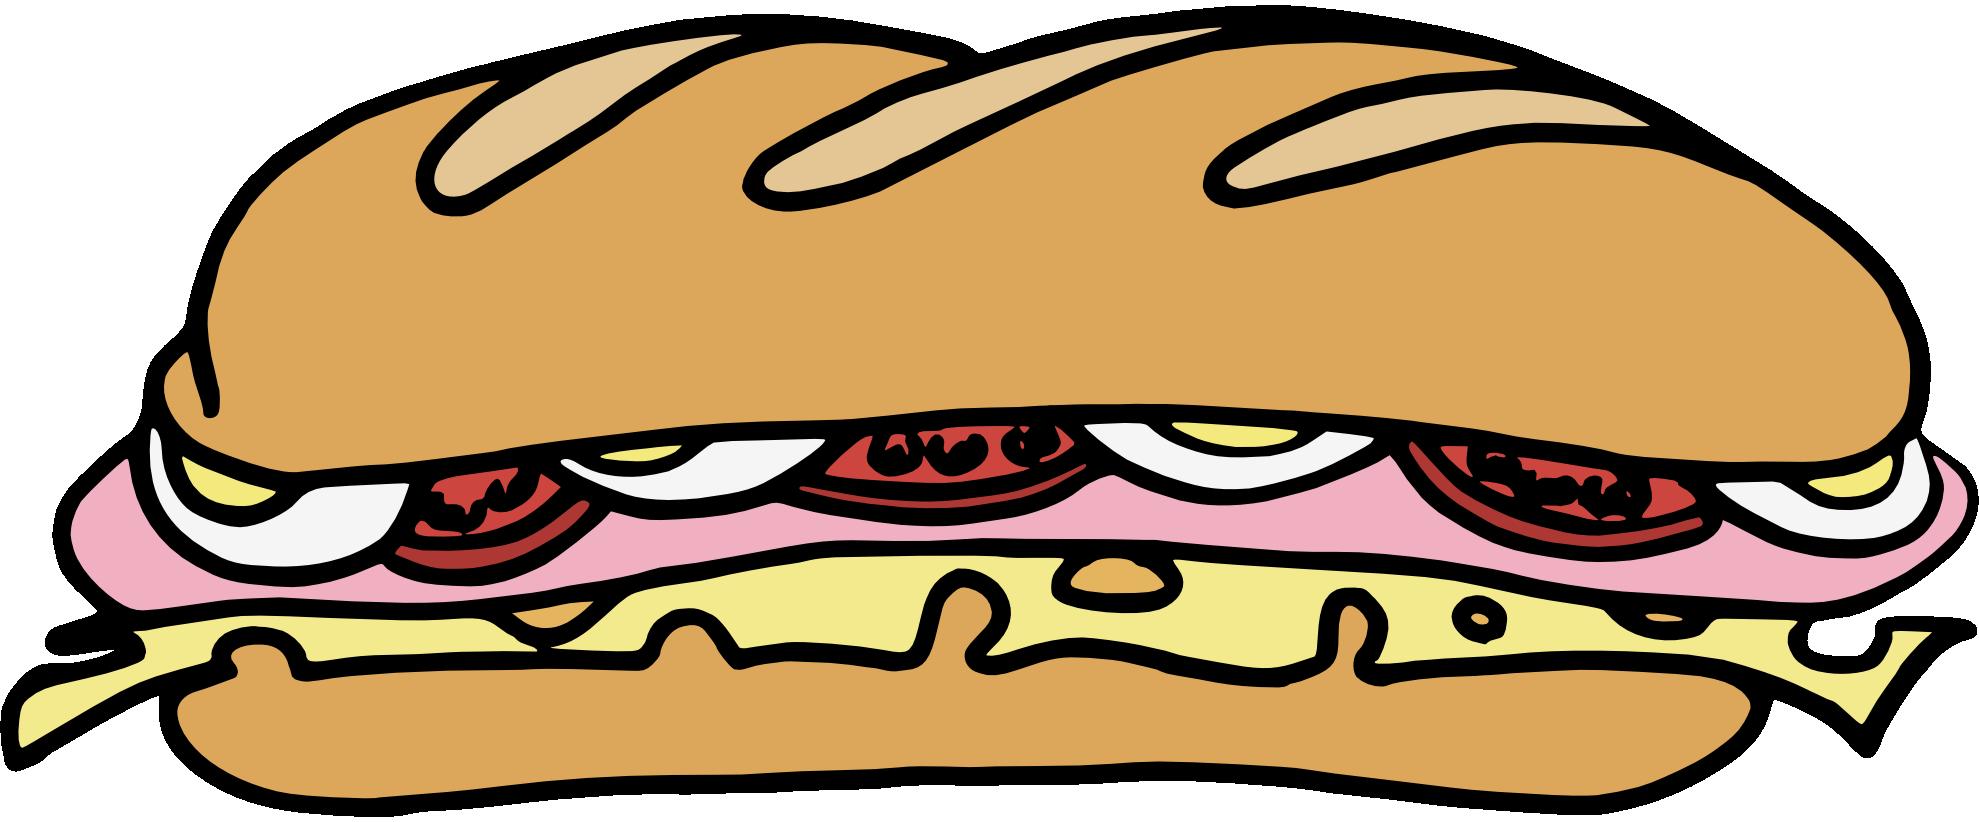 submarine sandwich. Sandwich clip art free clipart .